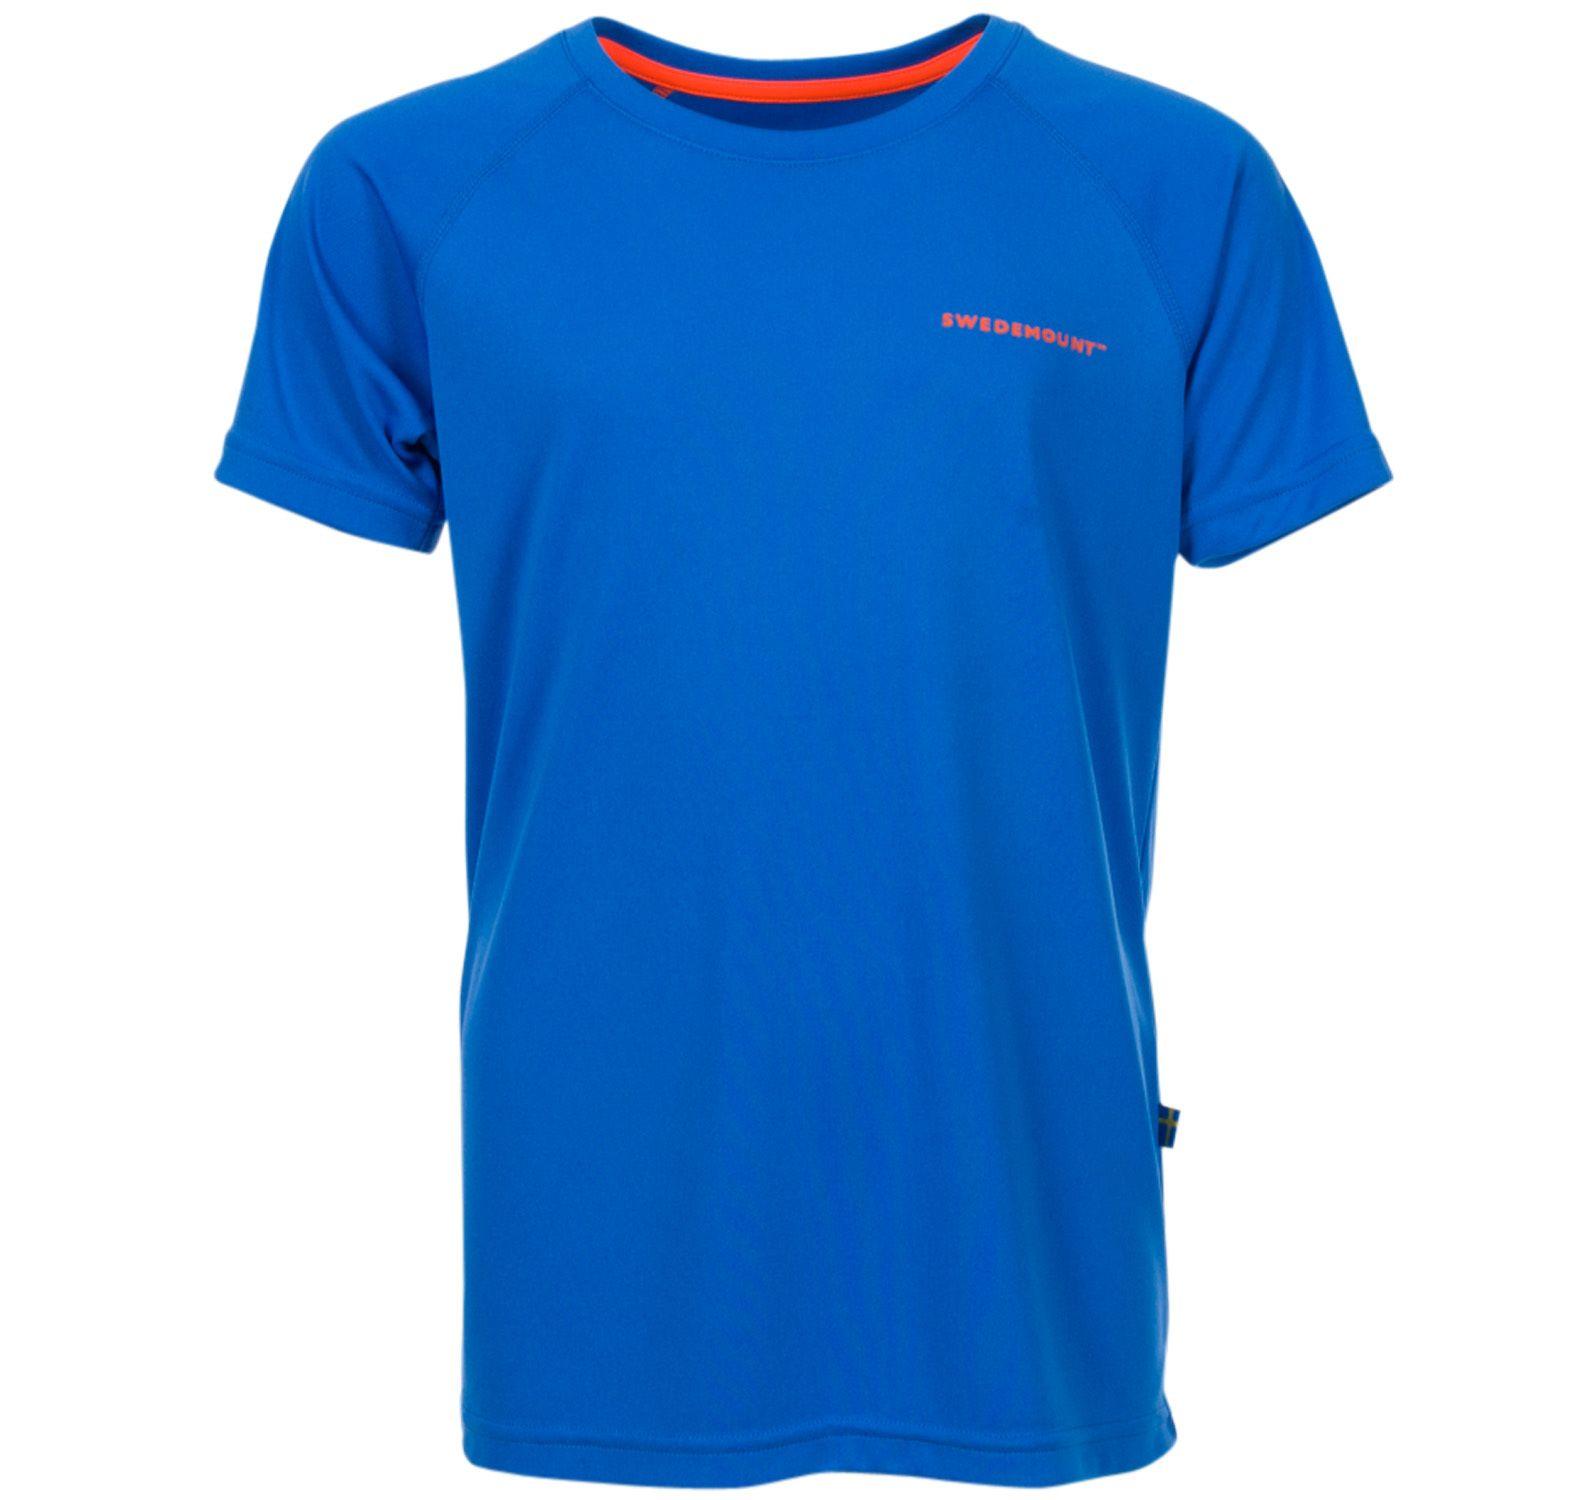 Active Tee Jr, Blue Melange/Orange, 140,  T-Shirts Och Linnen